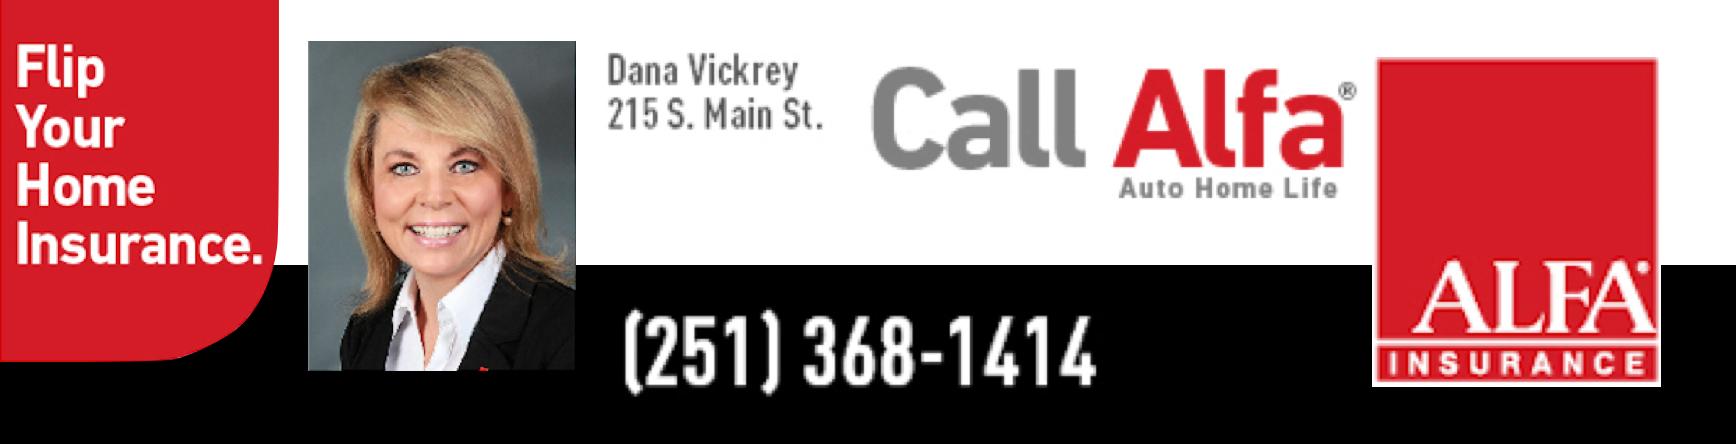 Alfa Insurance - Dana Vickrey Logo